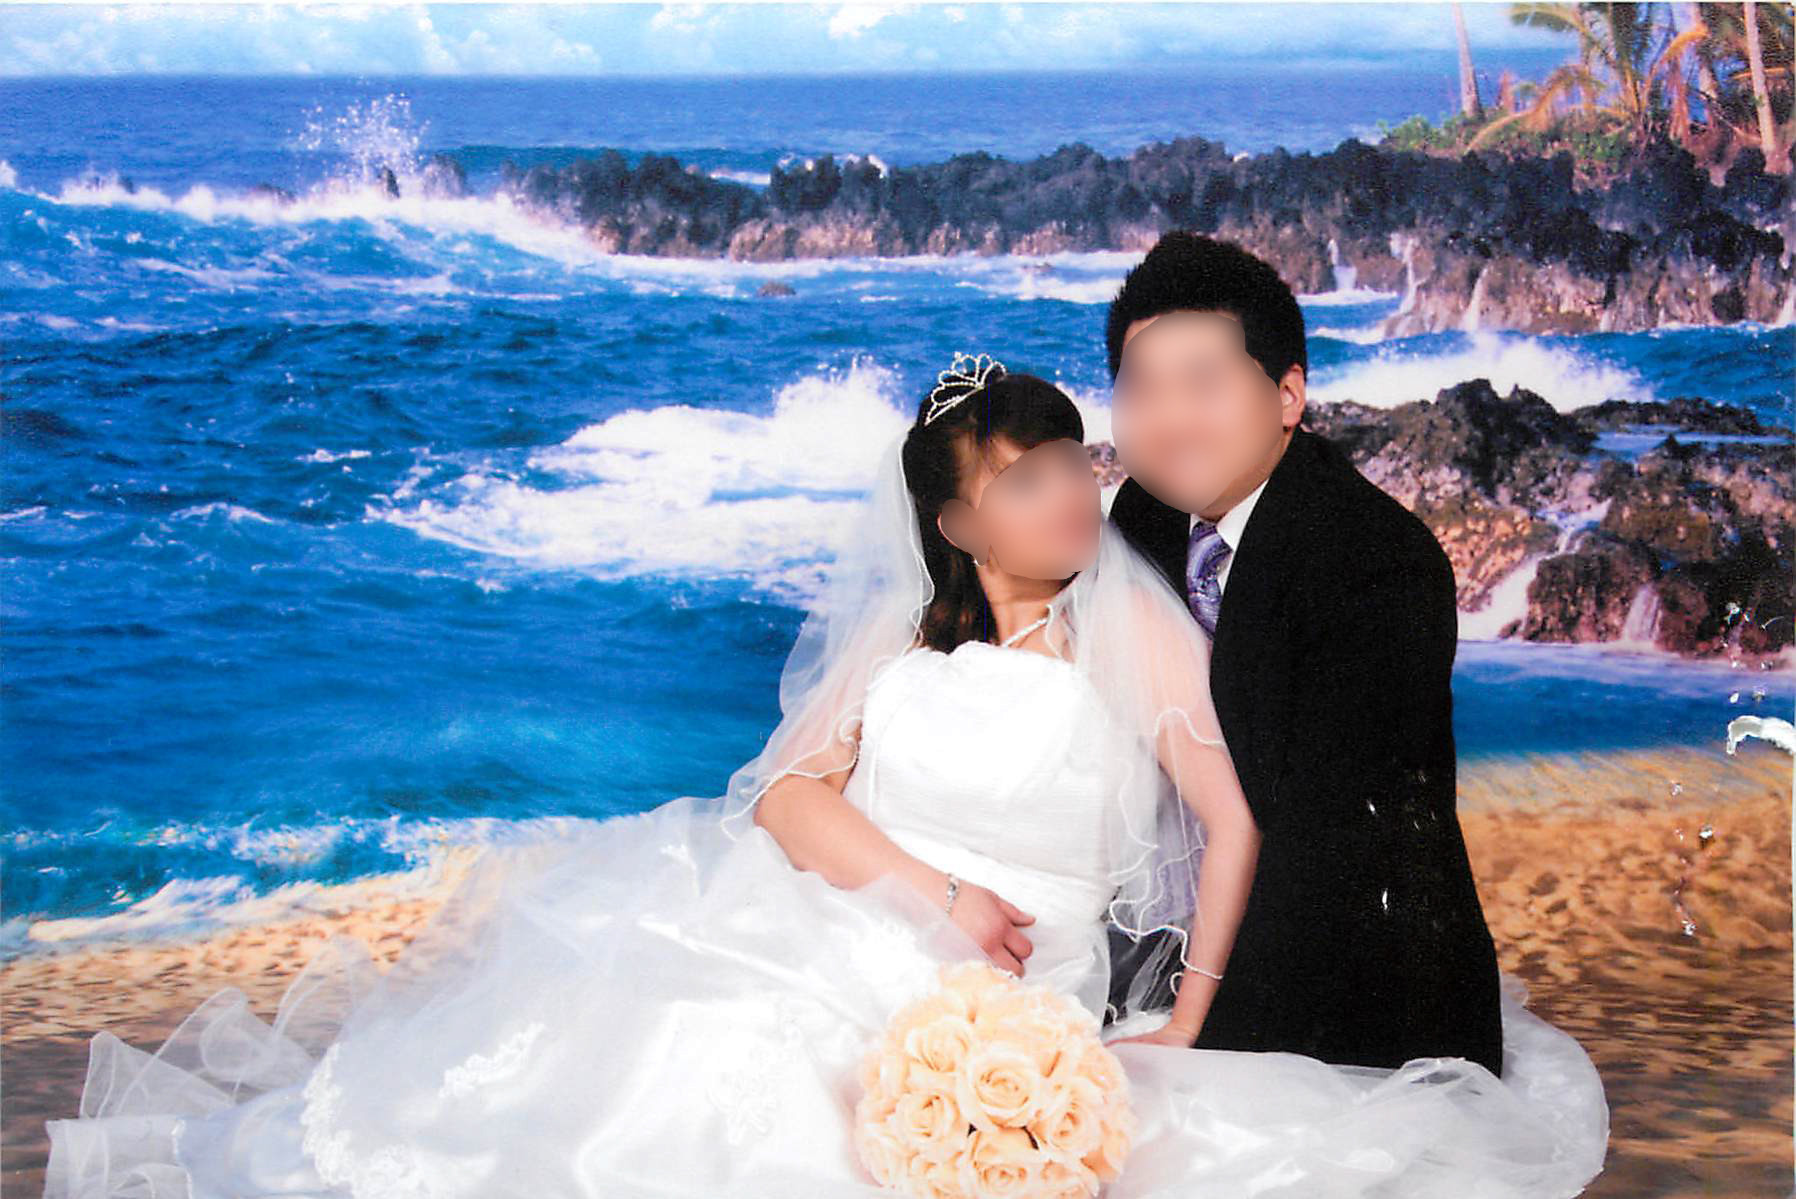 fake weddings and a honeymoon in vegas father and On fake wedding las vegas